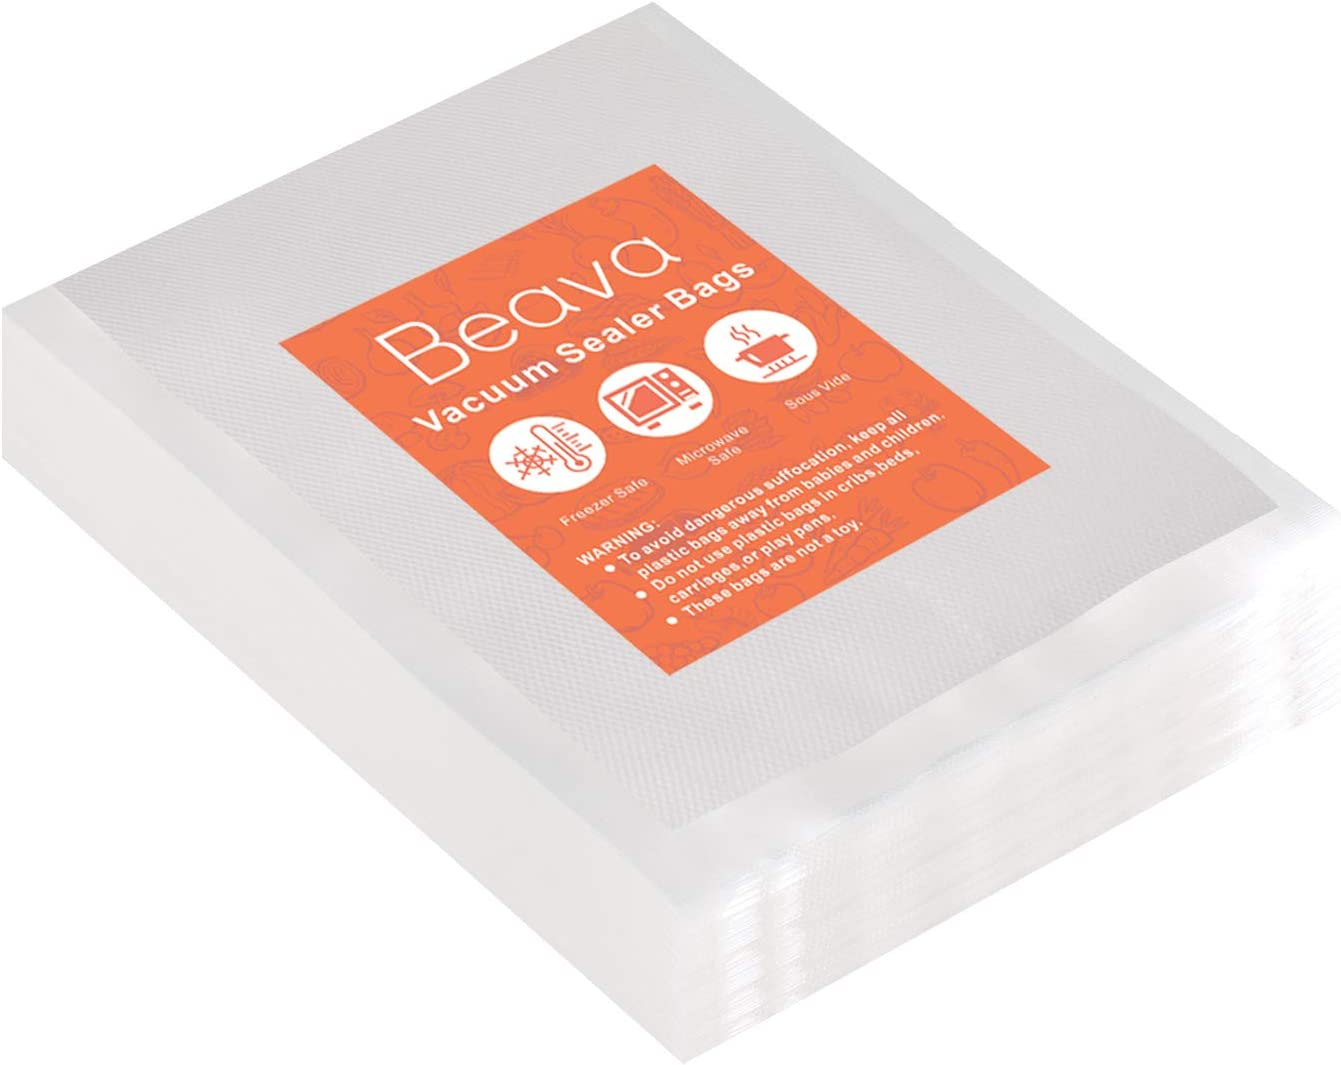 Vacuum Sealer Bags 5x7 Inch, Beava 100pcs Precut Vacuum Sealer Bags for food, Embossed Commercial Grade Food Saver Bags for Seal a Meal, Sous Vide Cooking or Meal Prep